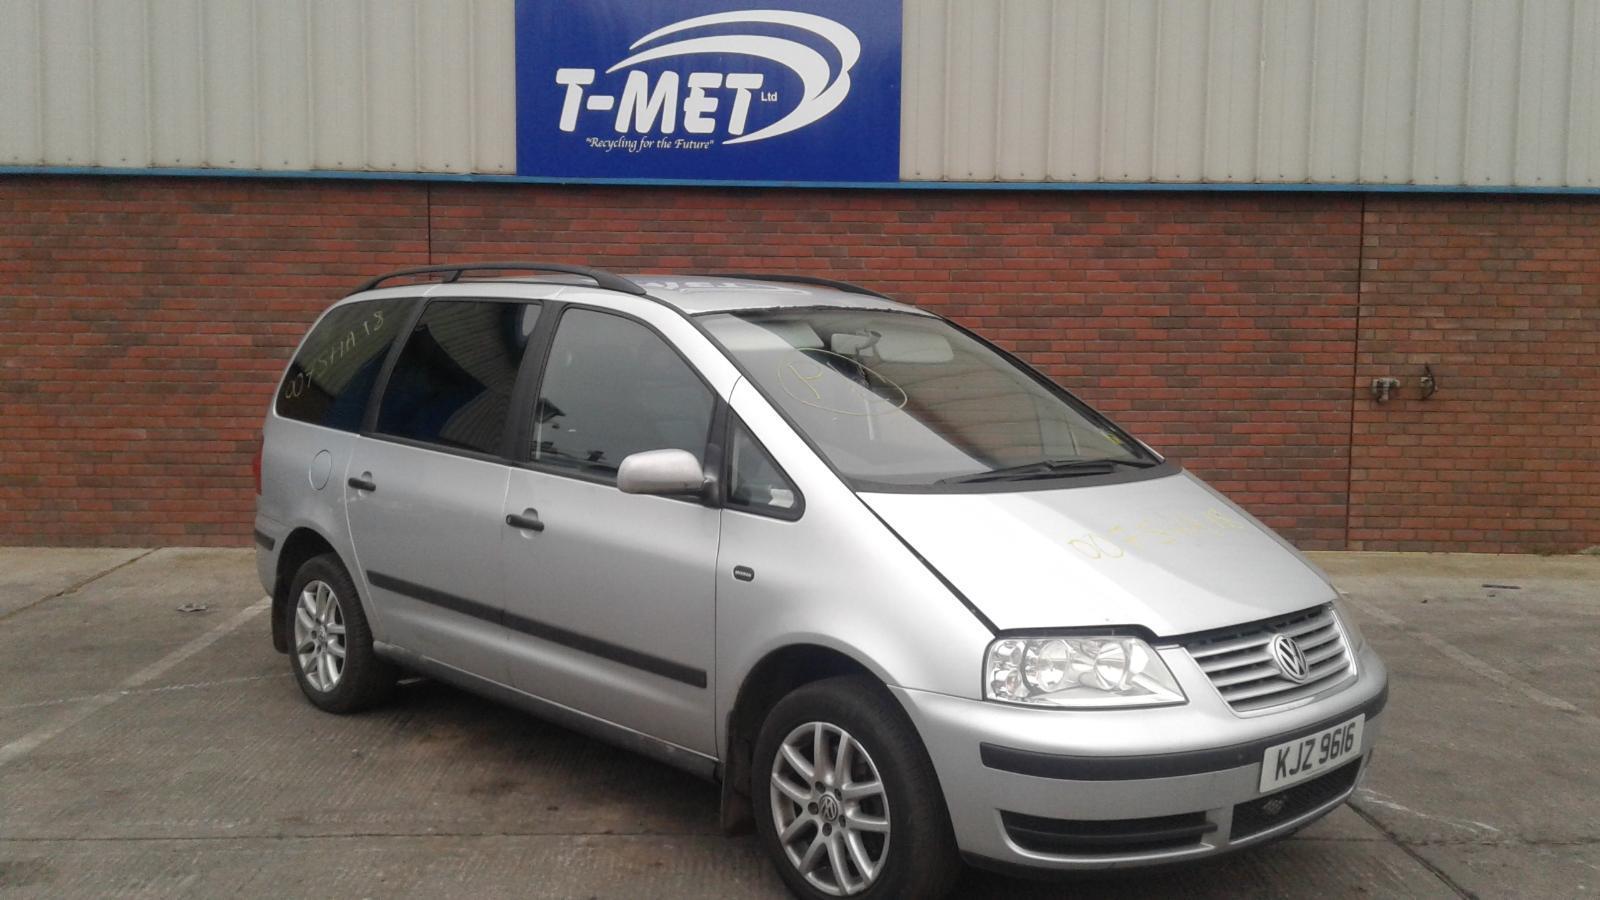 2006 Volkswagen SHARAN SE TDI Image